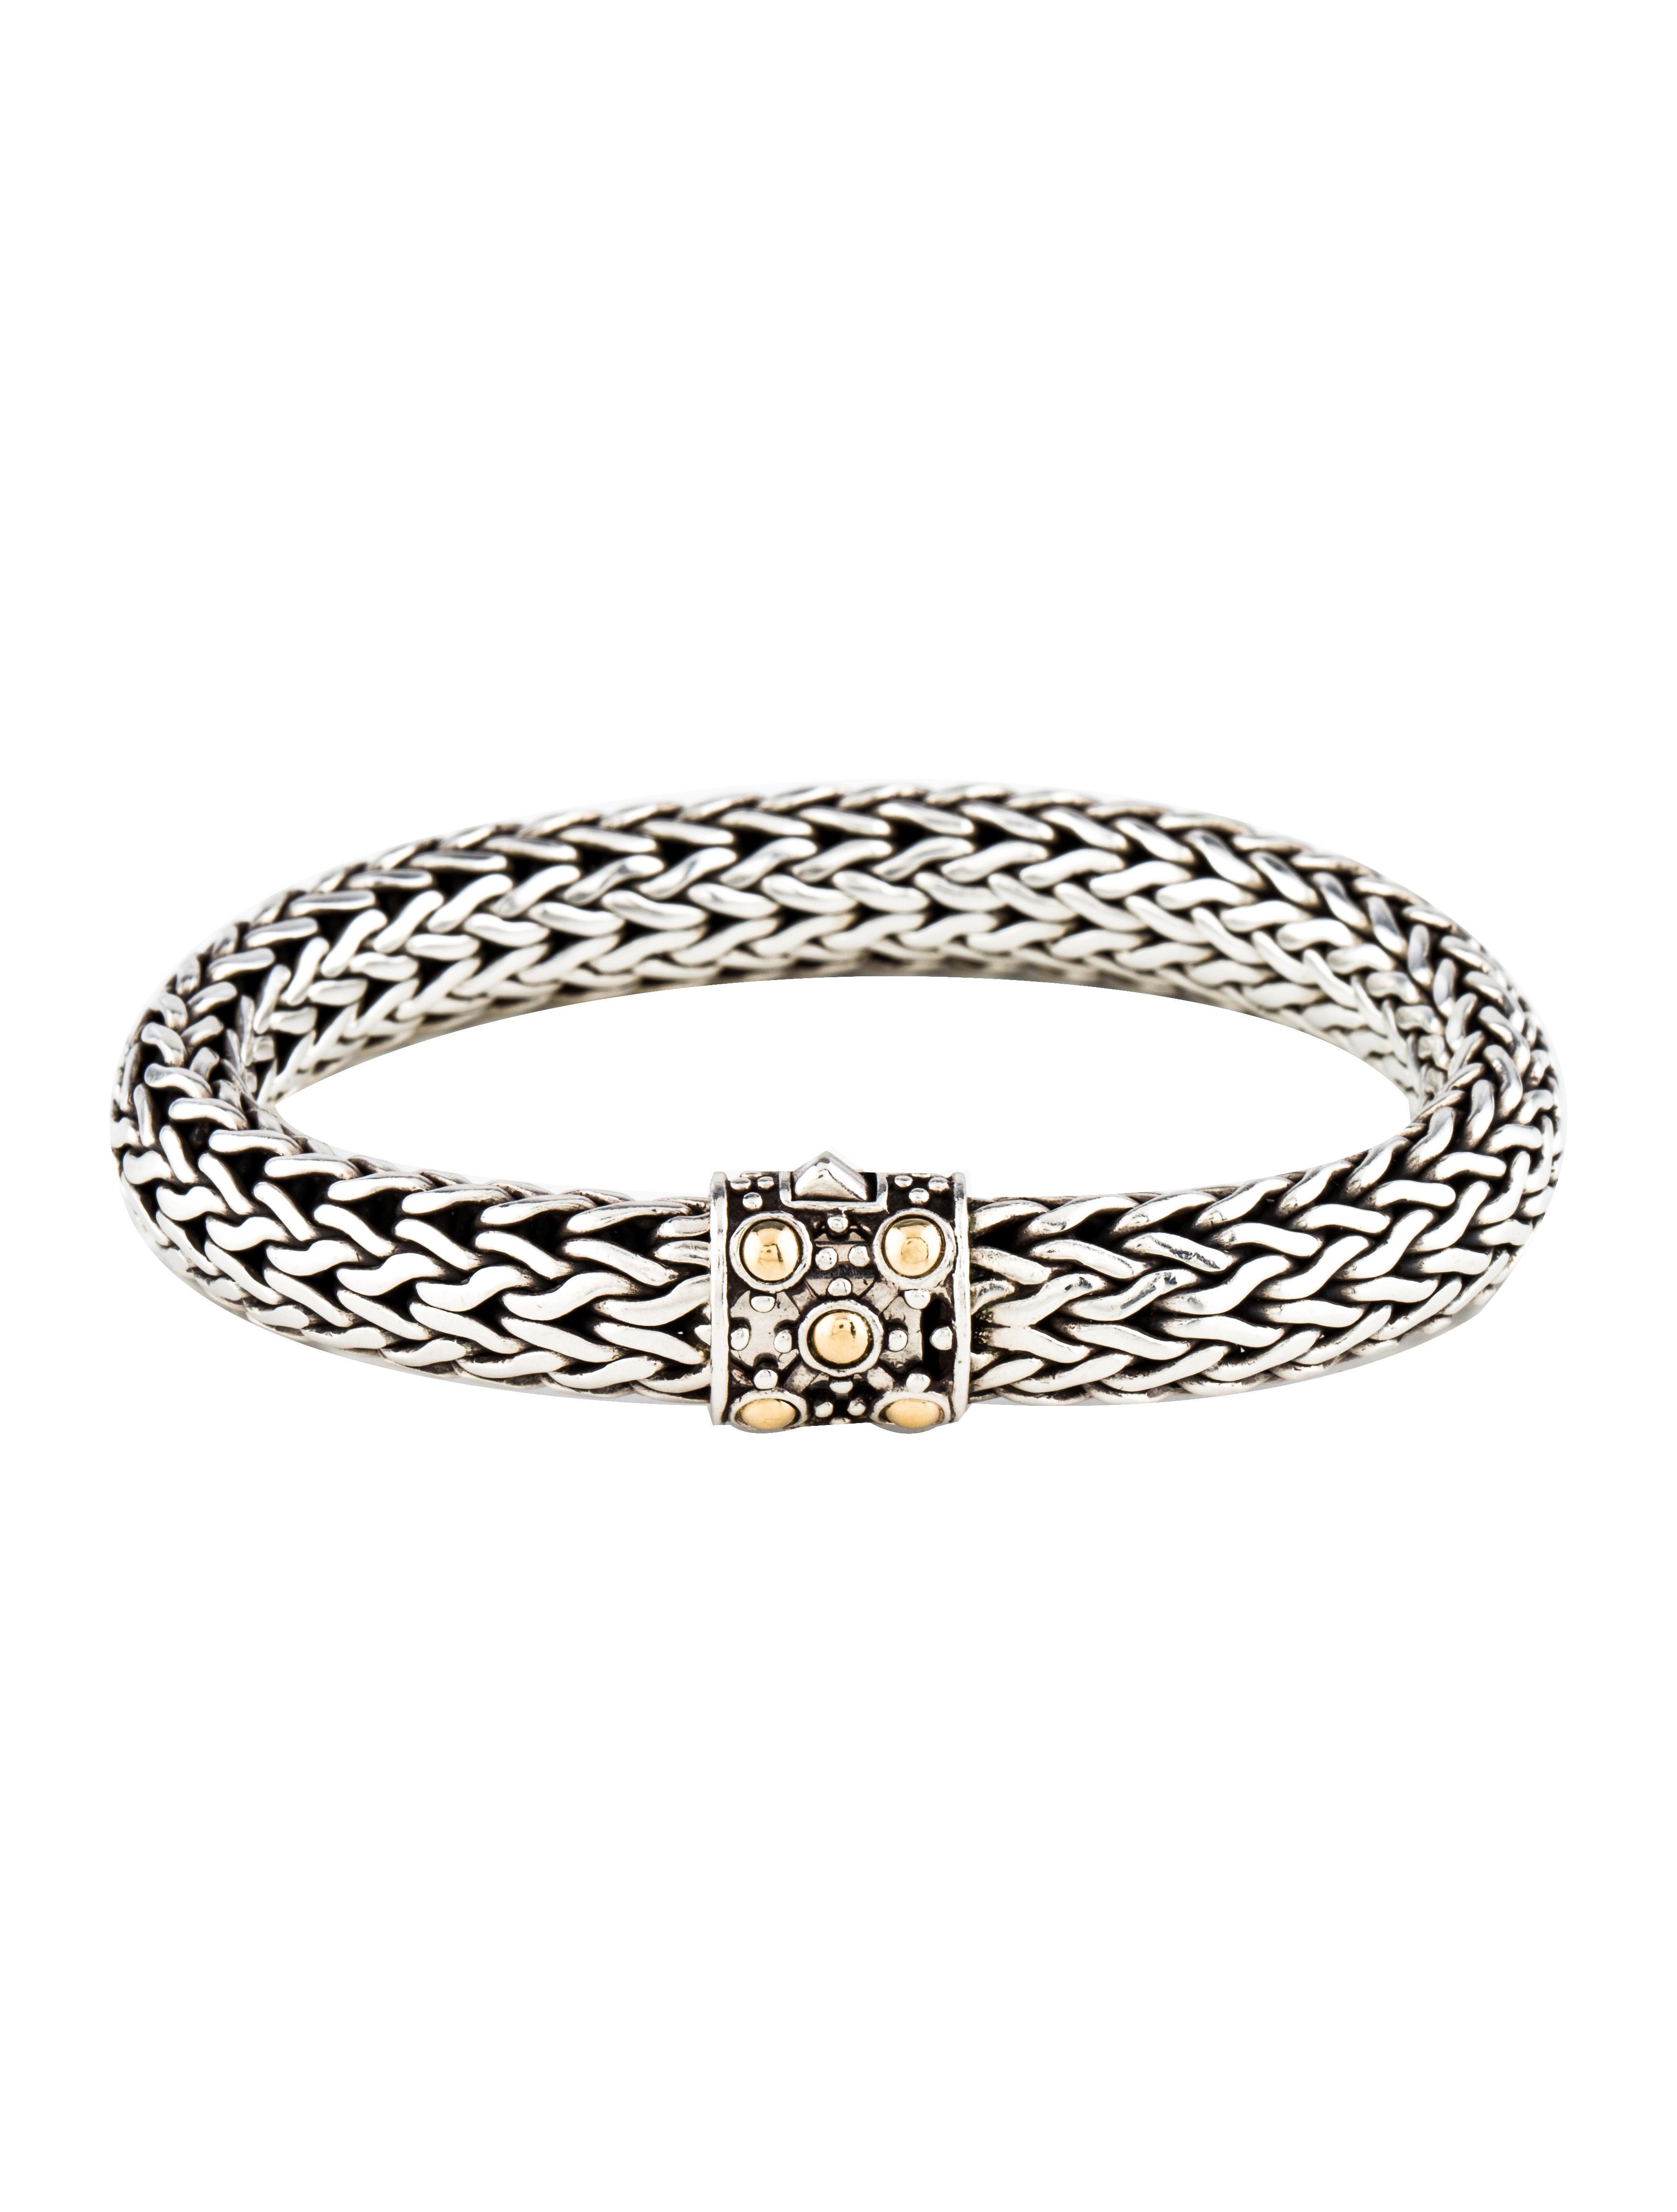 John Hardy Classic Chain Bracelet Xxl QKshCQ3dT5